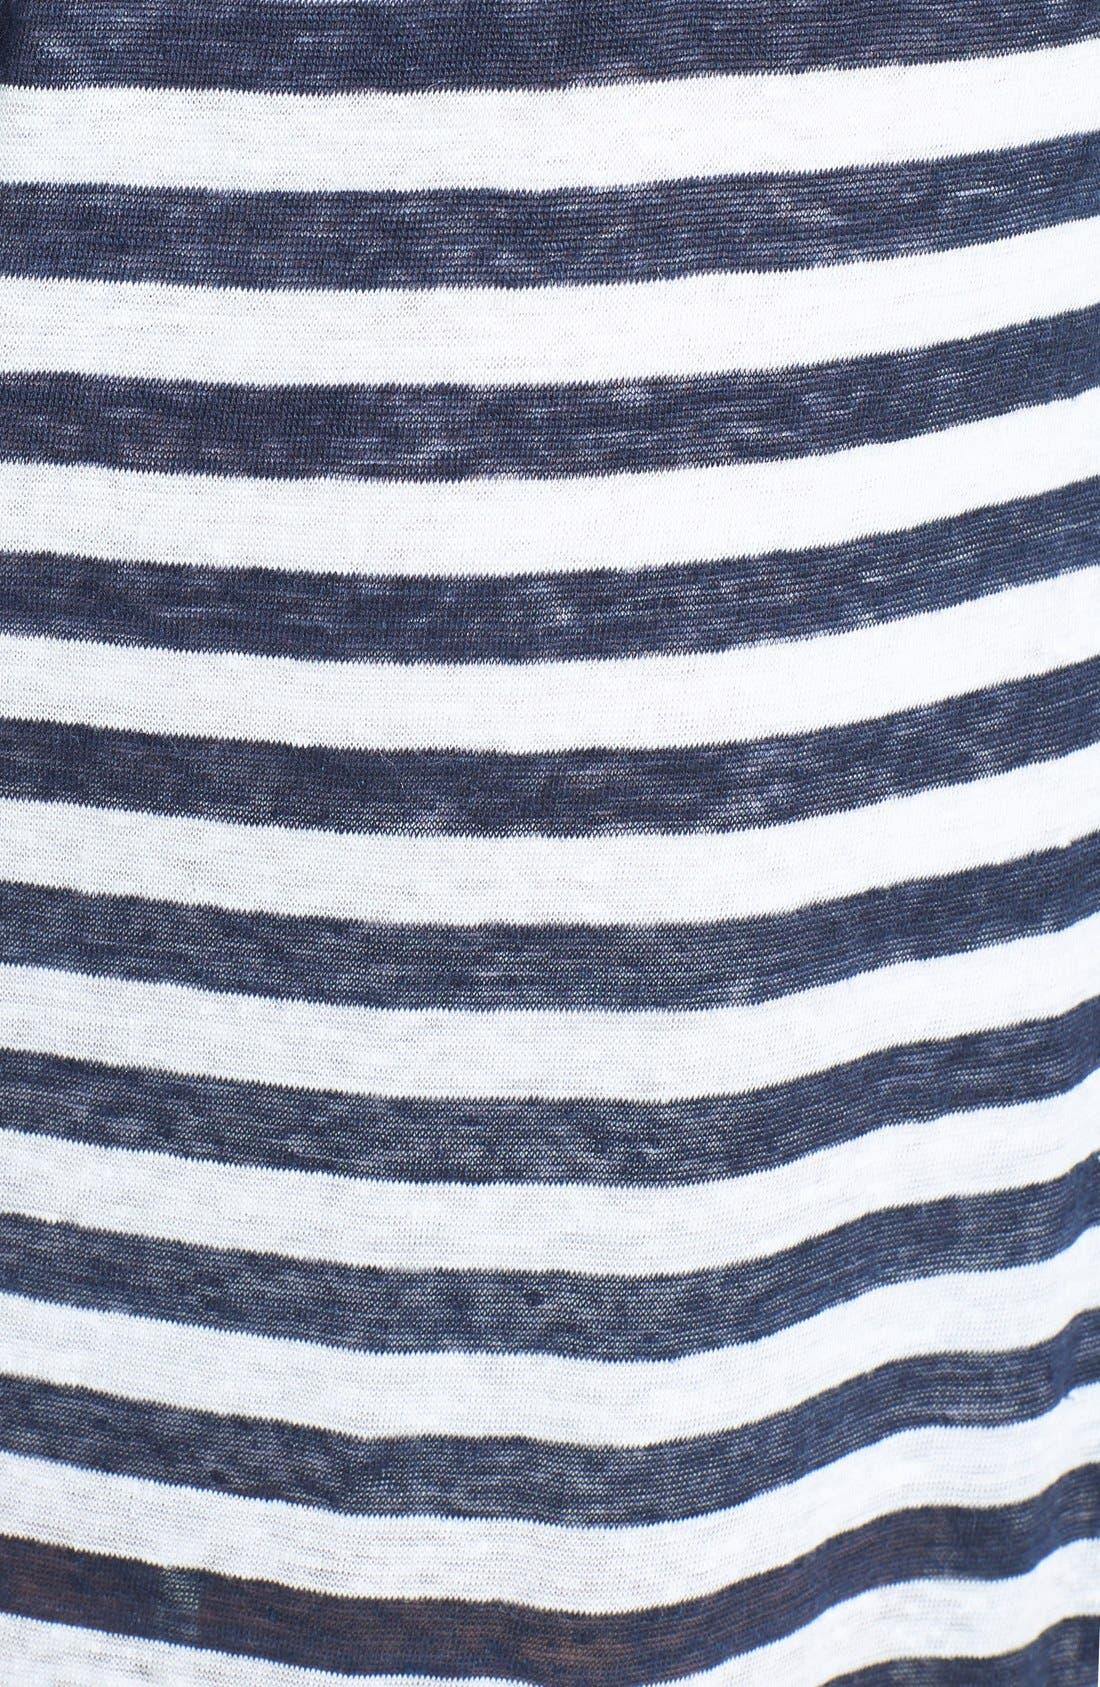 Alternate Image 3  - C & C California Stripe Linen Jersey Maxi Dress